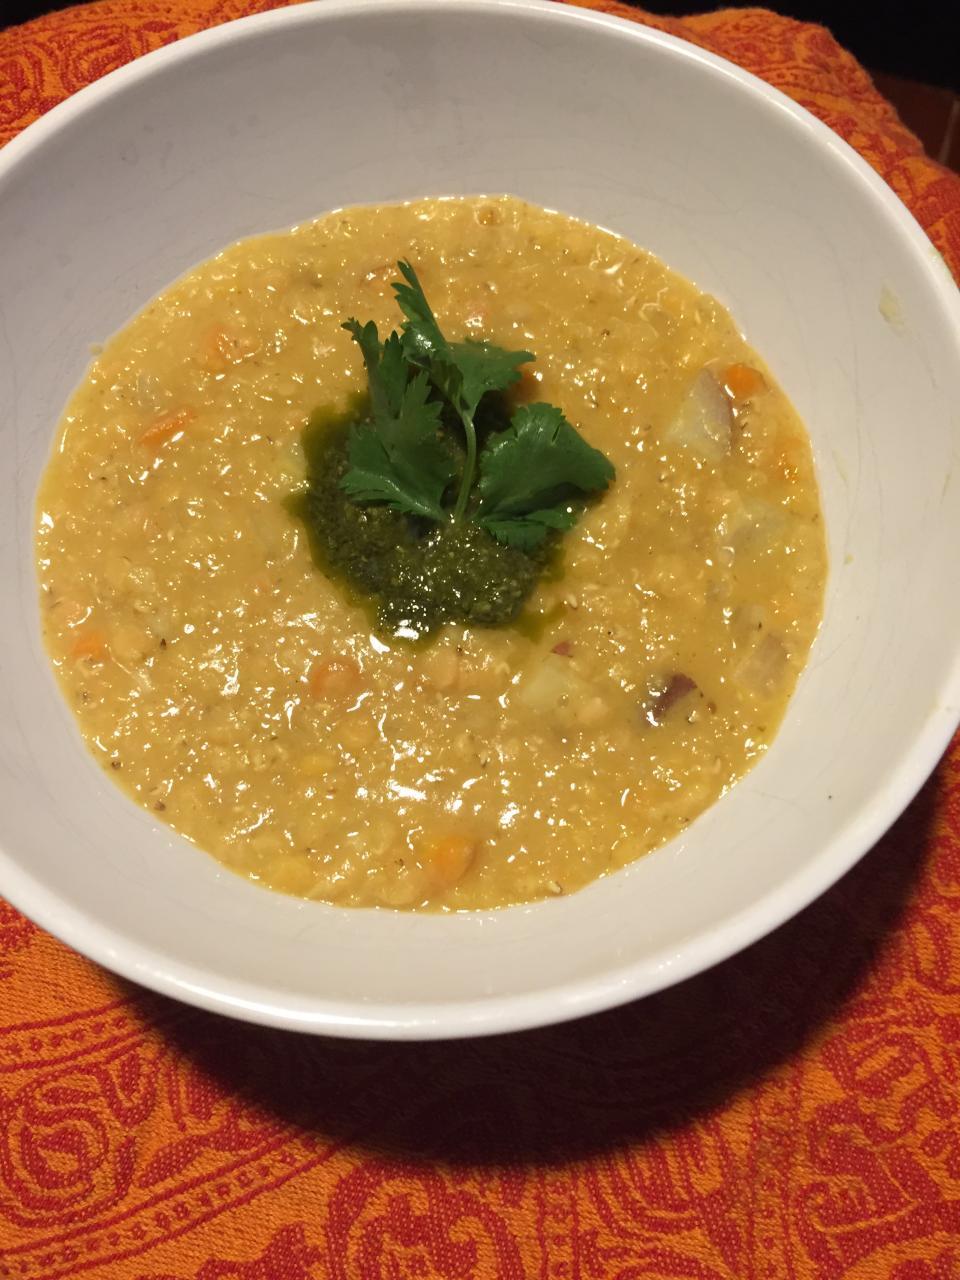 Red Lentil Soup with Lemon